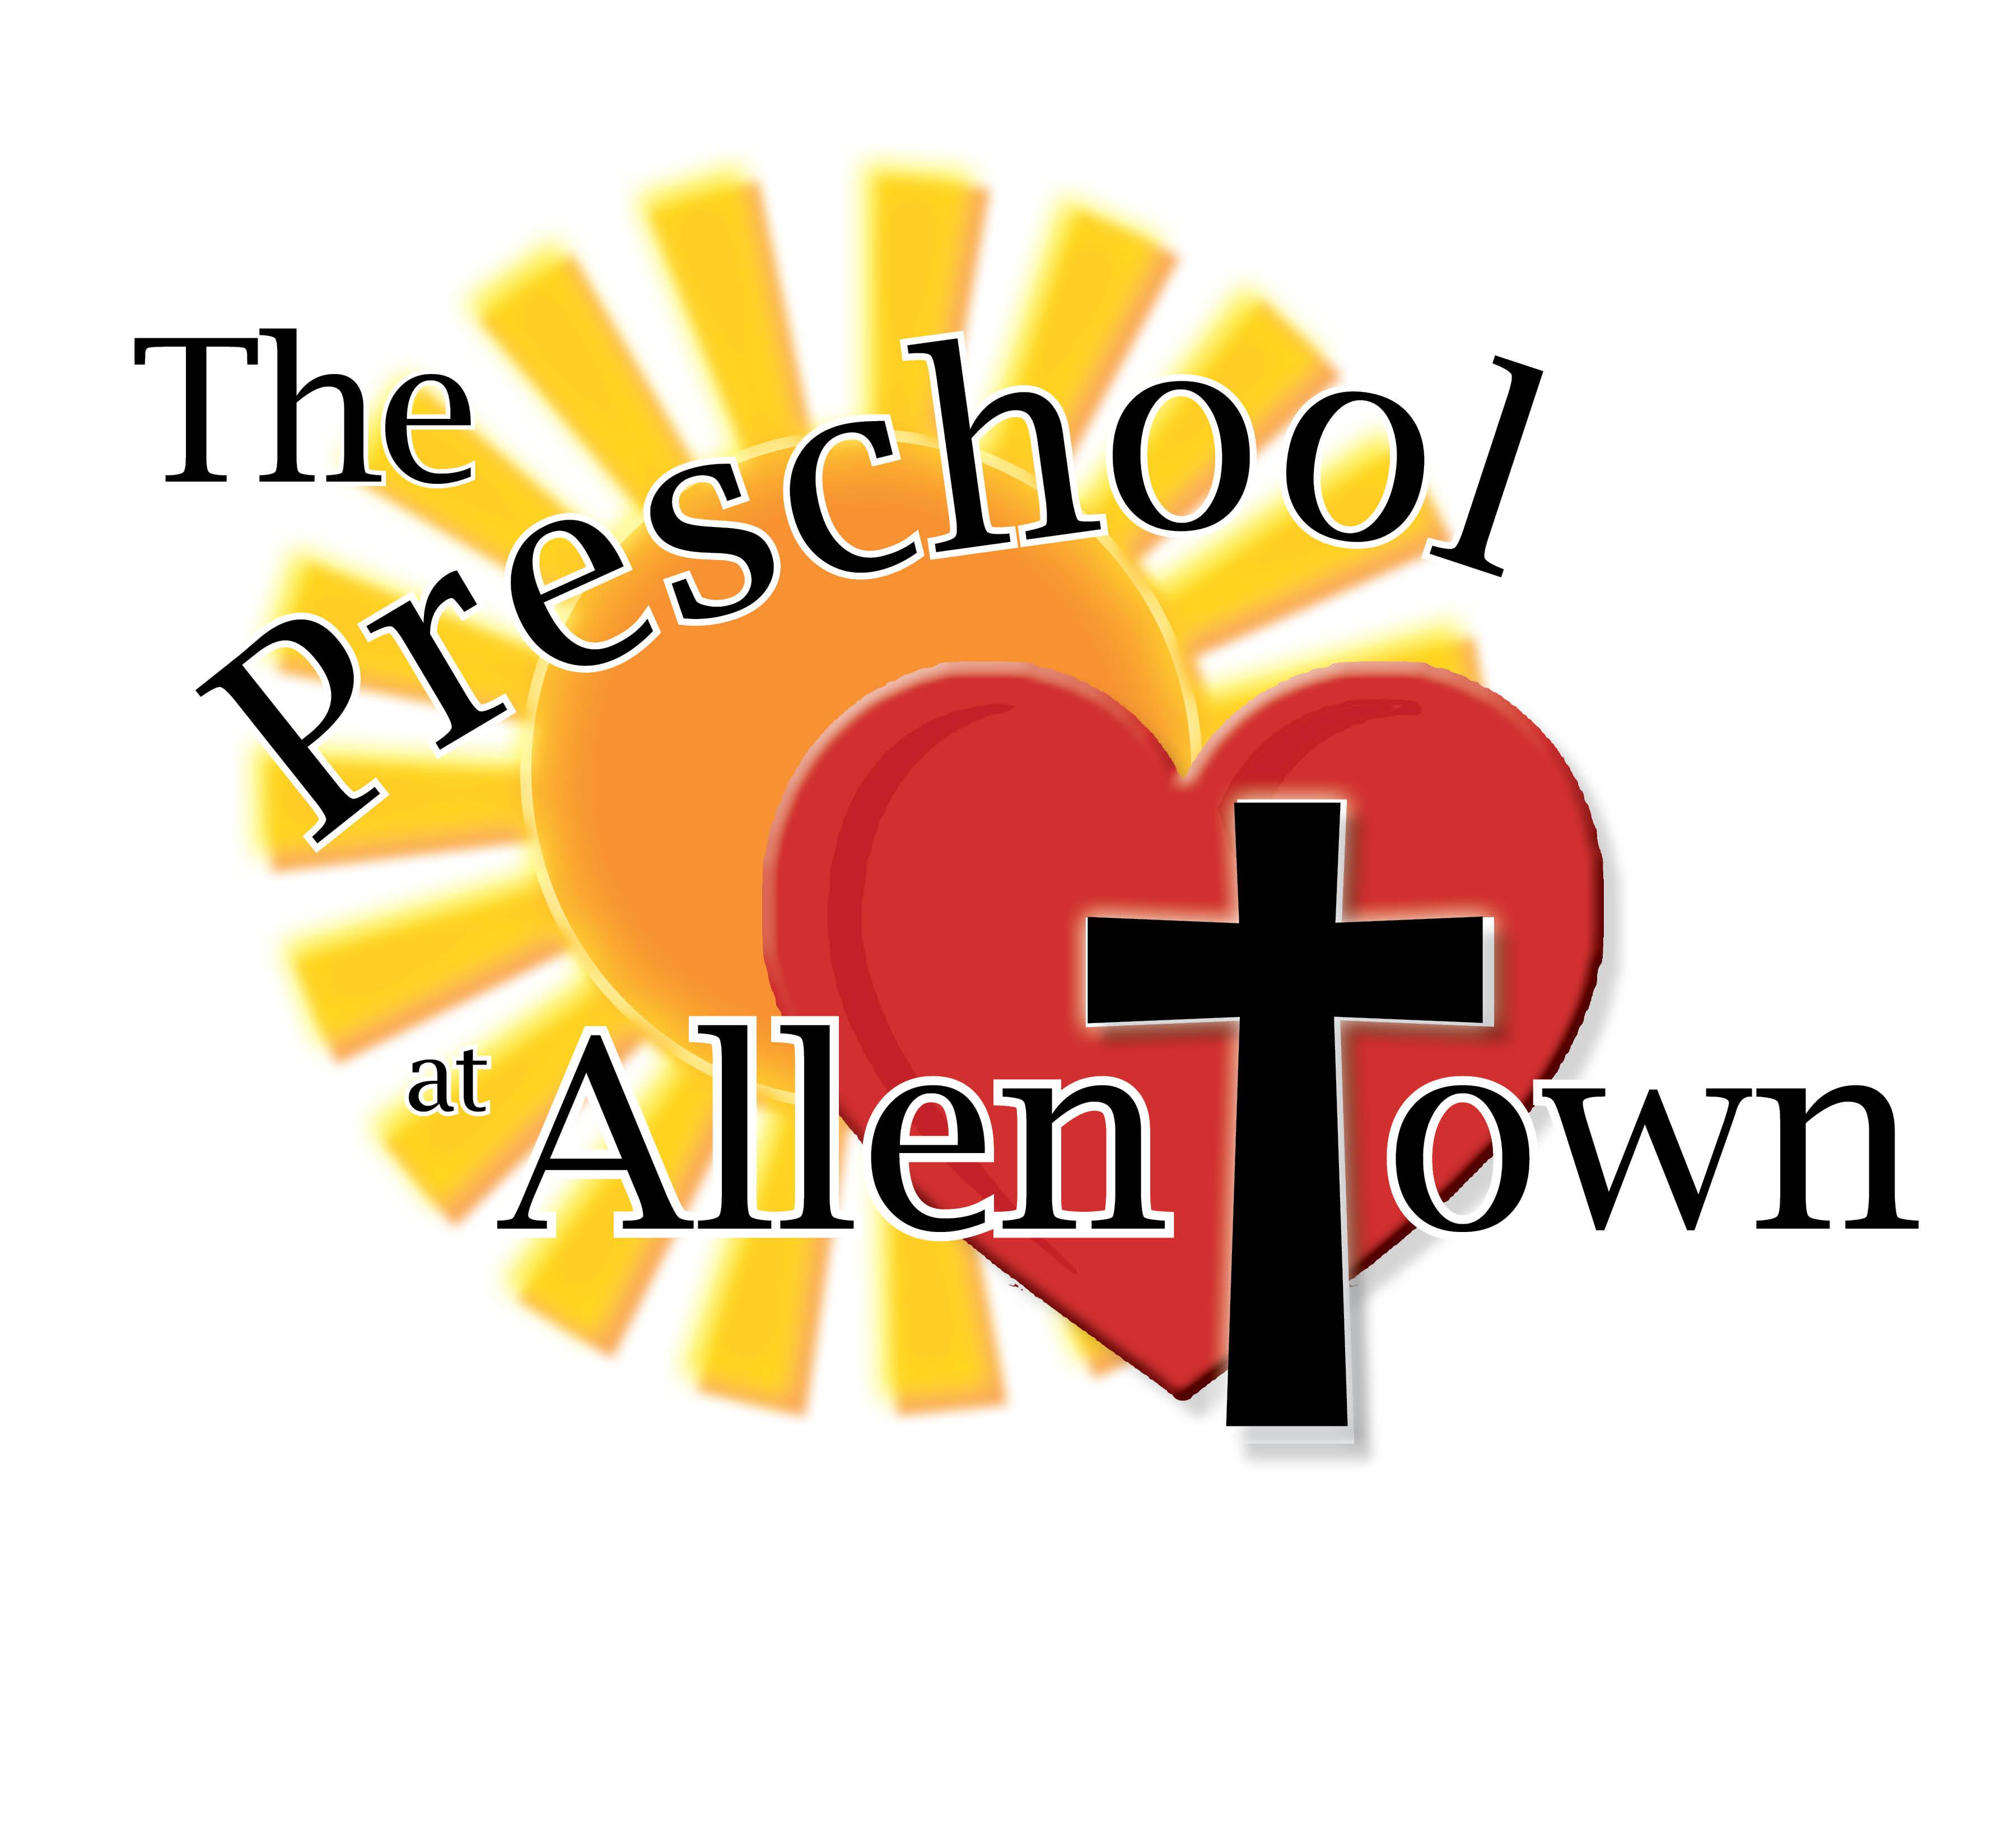 THE PRESCHOOL AT ALLENTOWN